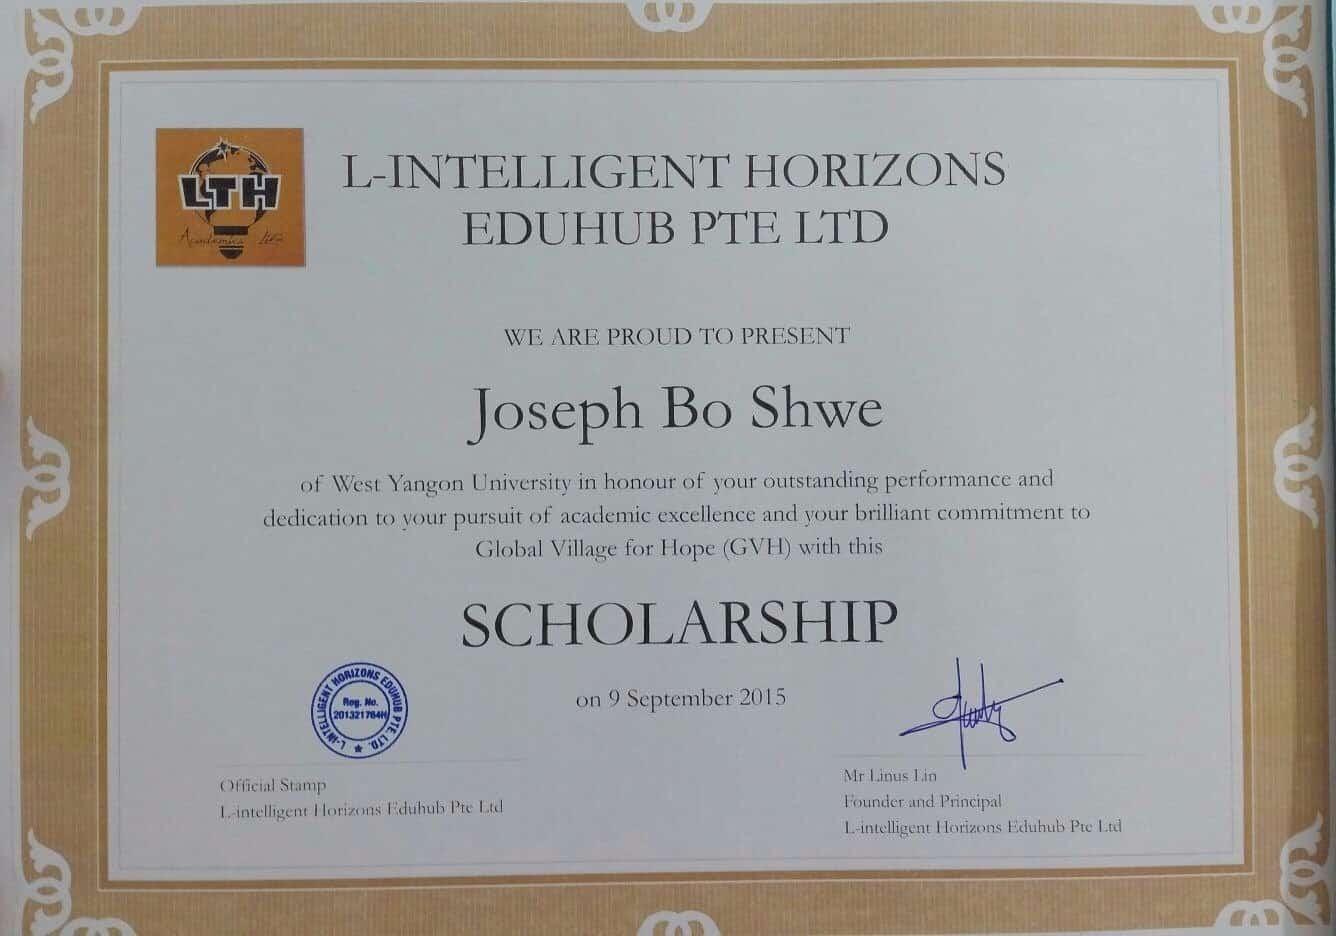 Scholarship Certificate Lth L Intelligent Horizons